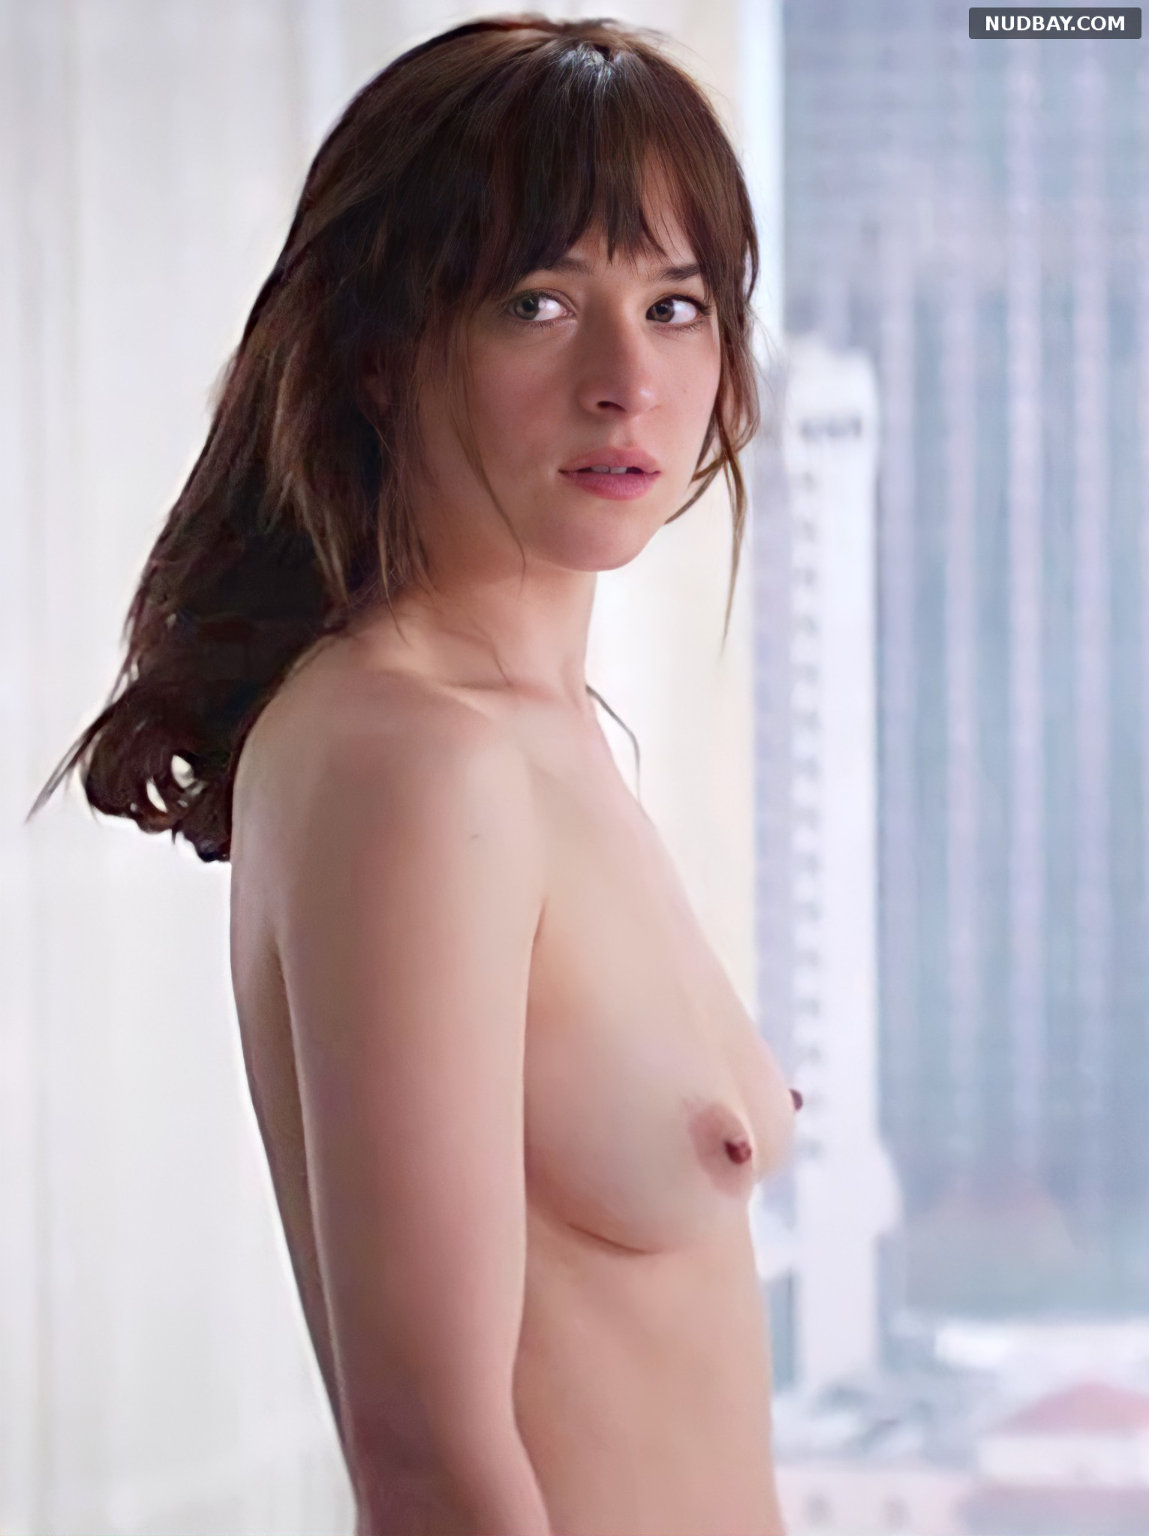 Dakota Johnson Nude